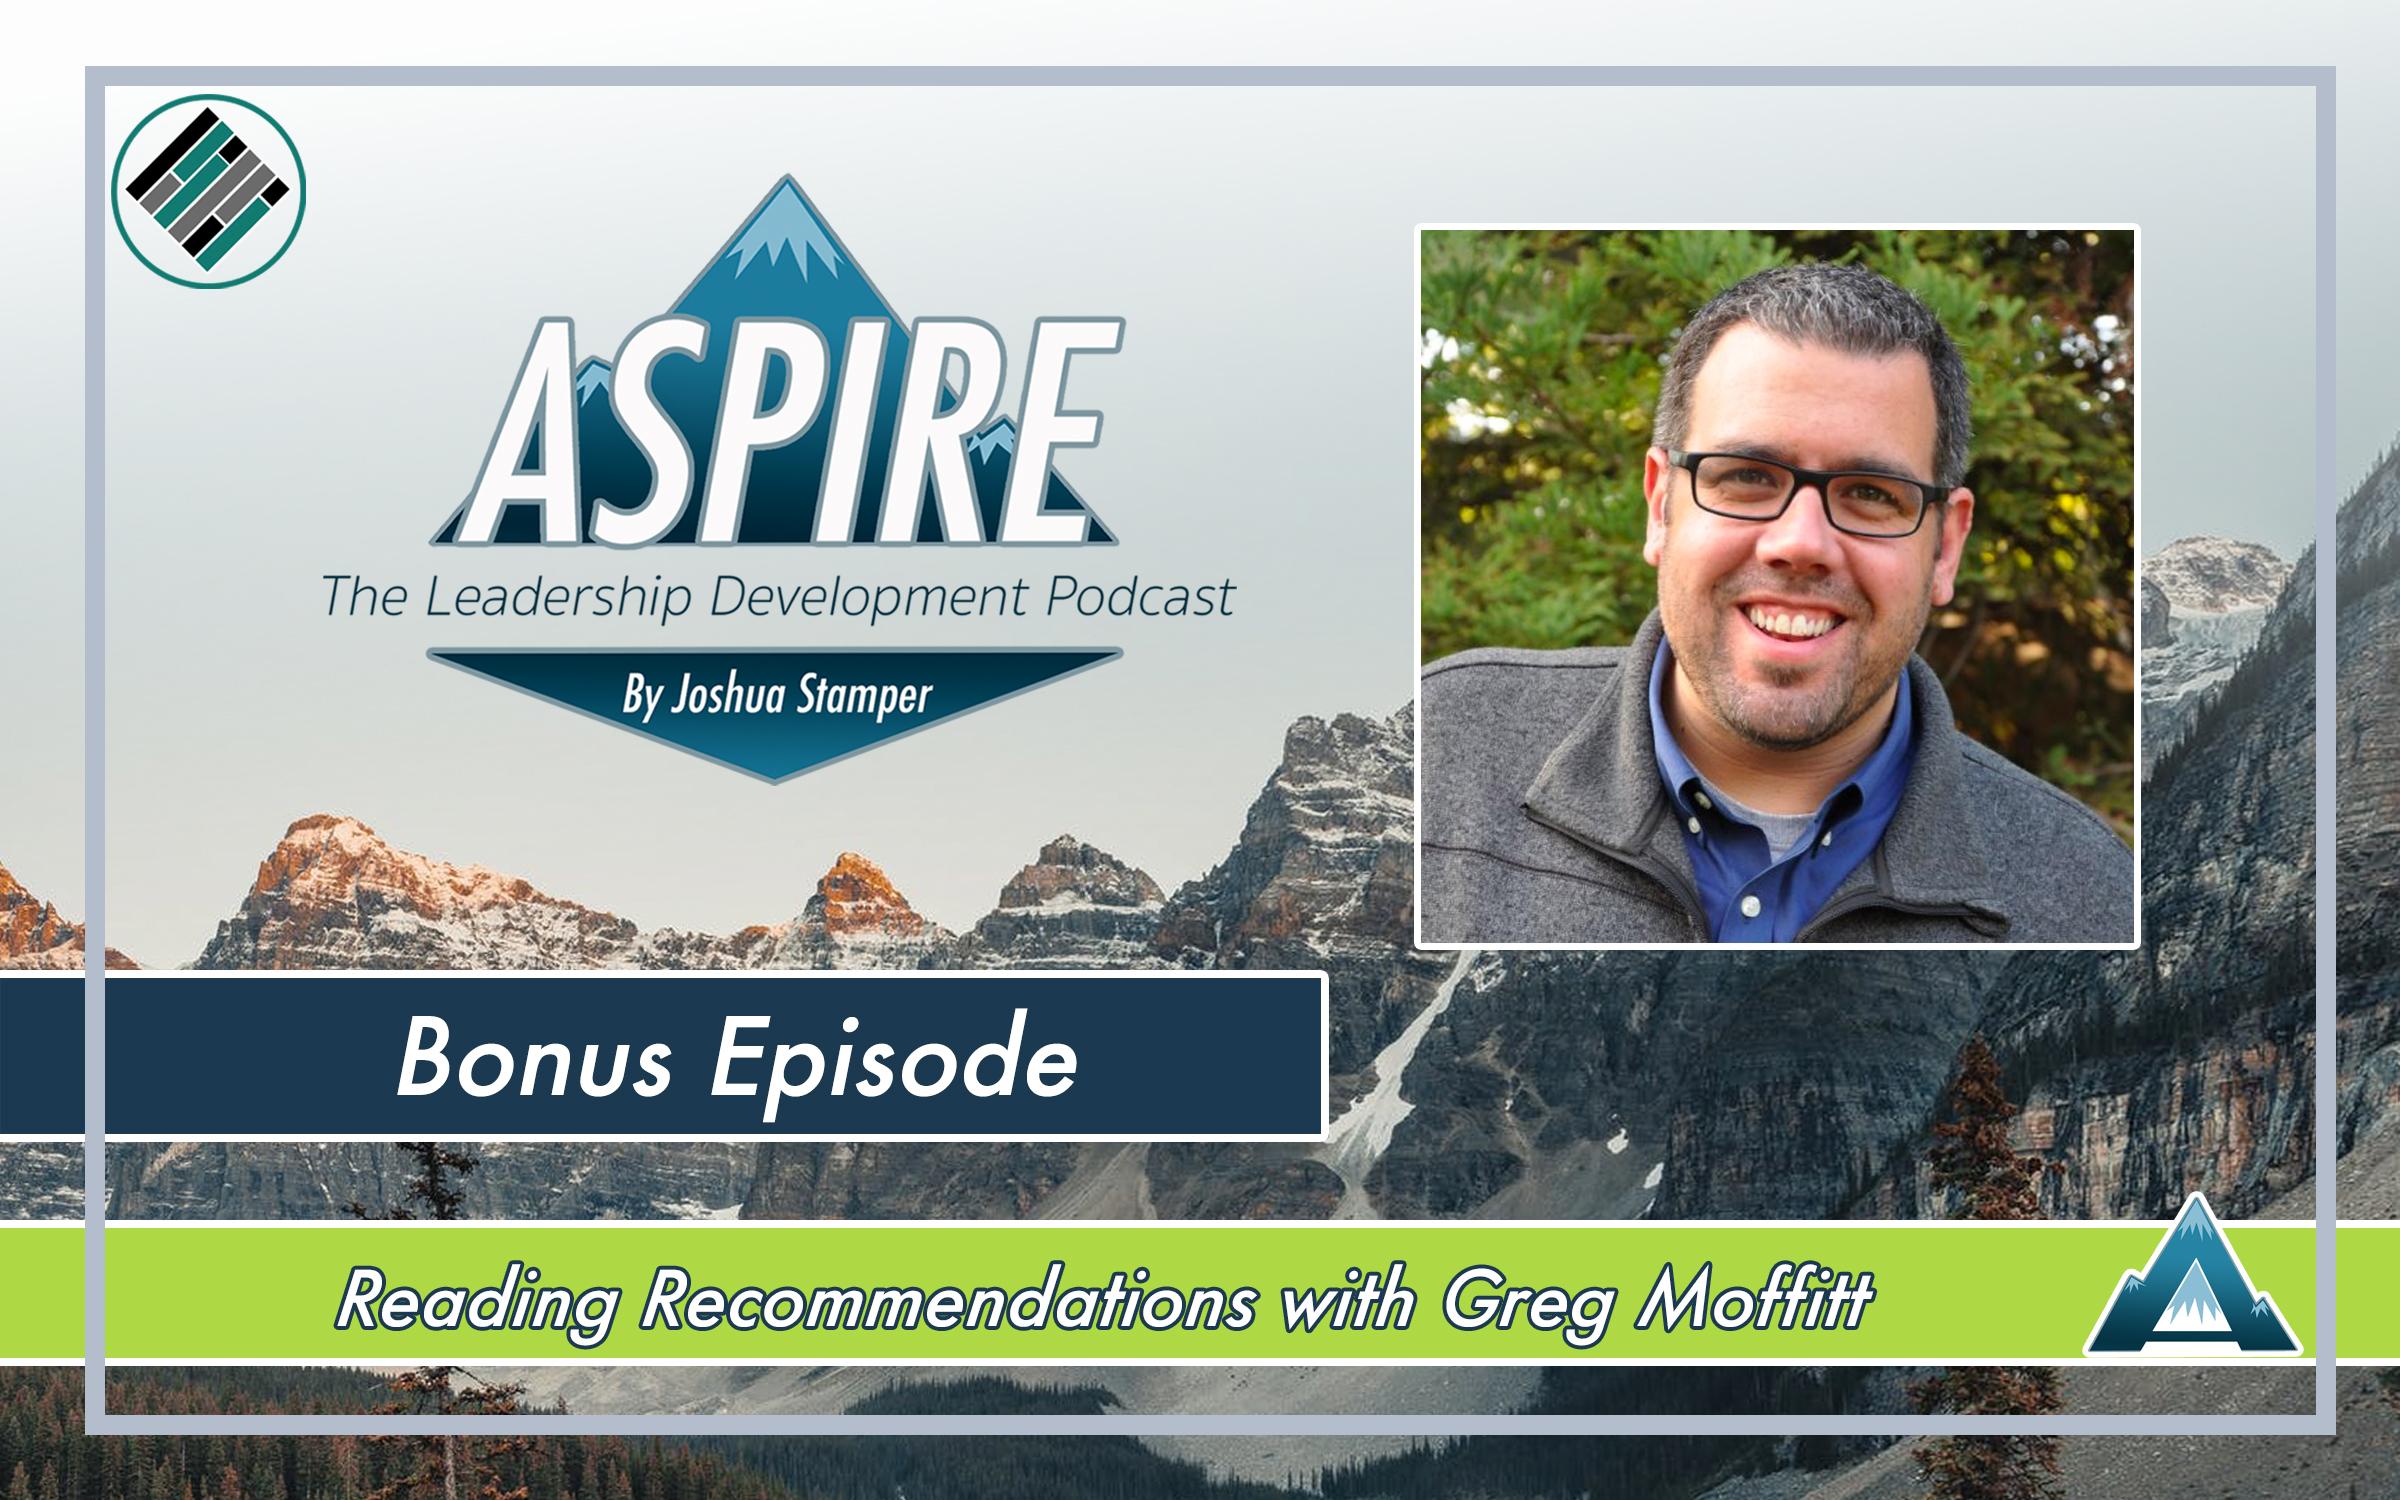 Joshua Stamper, Greg Moffitt, Aspire: The Leadership Development Podcast, #AspireLead